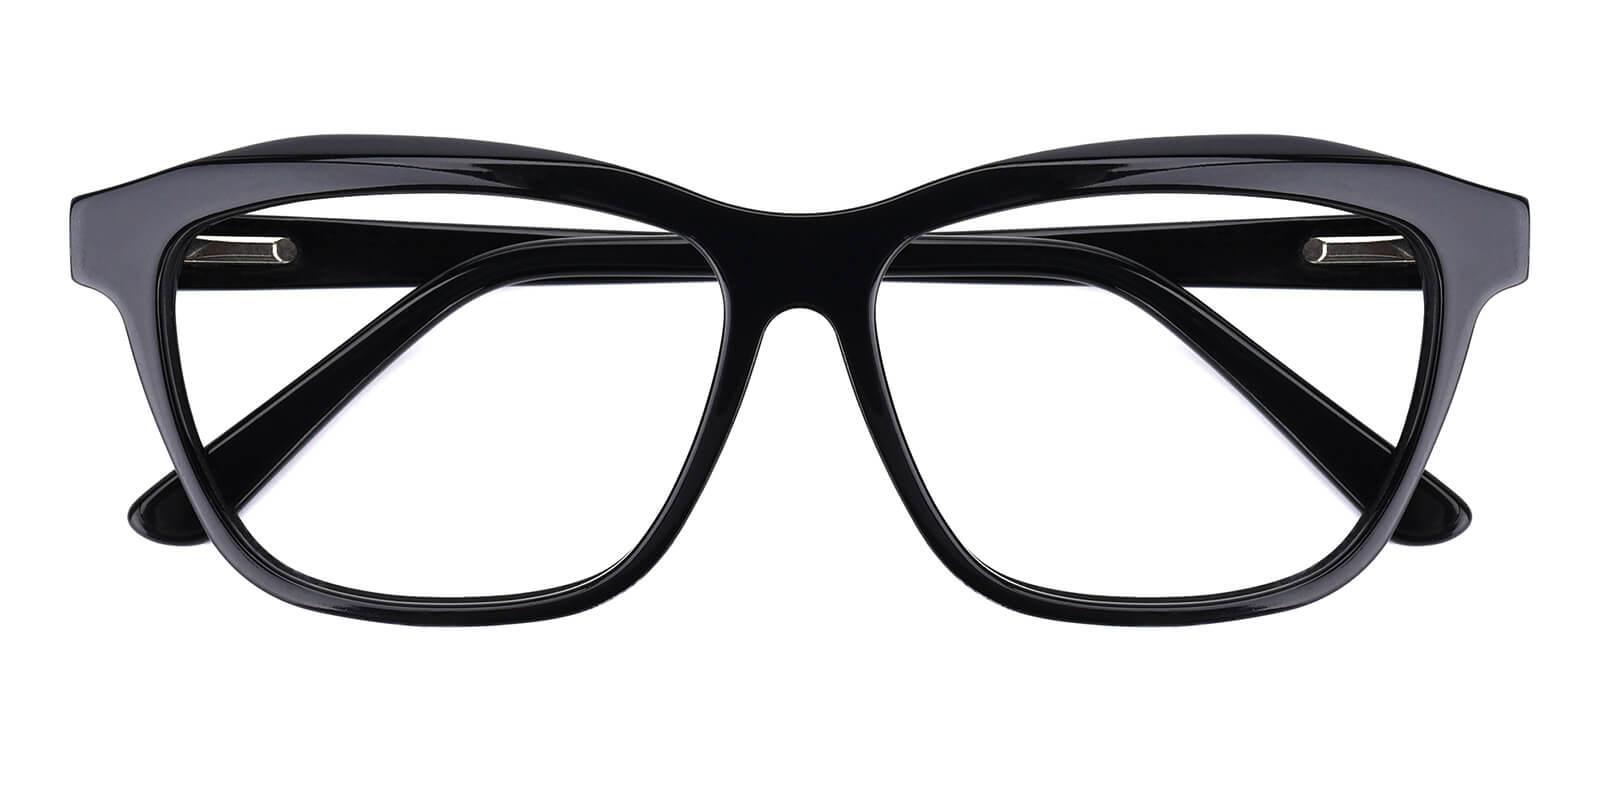 Gate-Black-Cat / Geometric-Acetate-Eyeglasses-detail